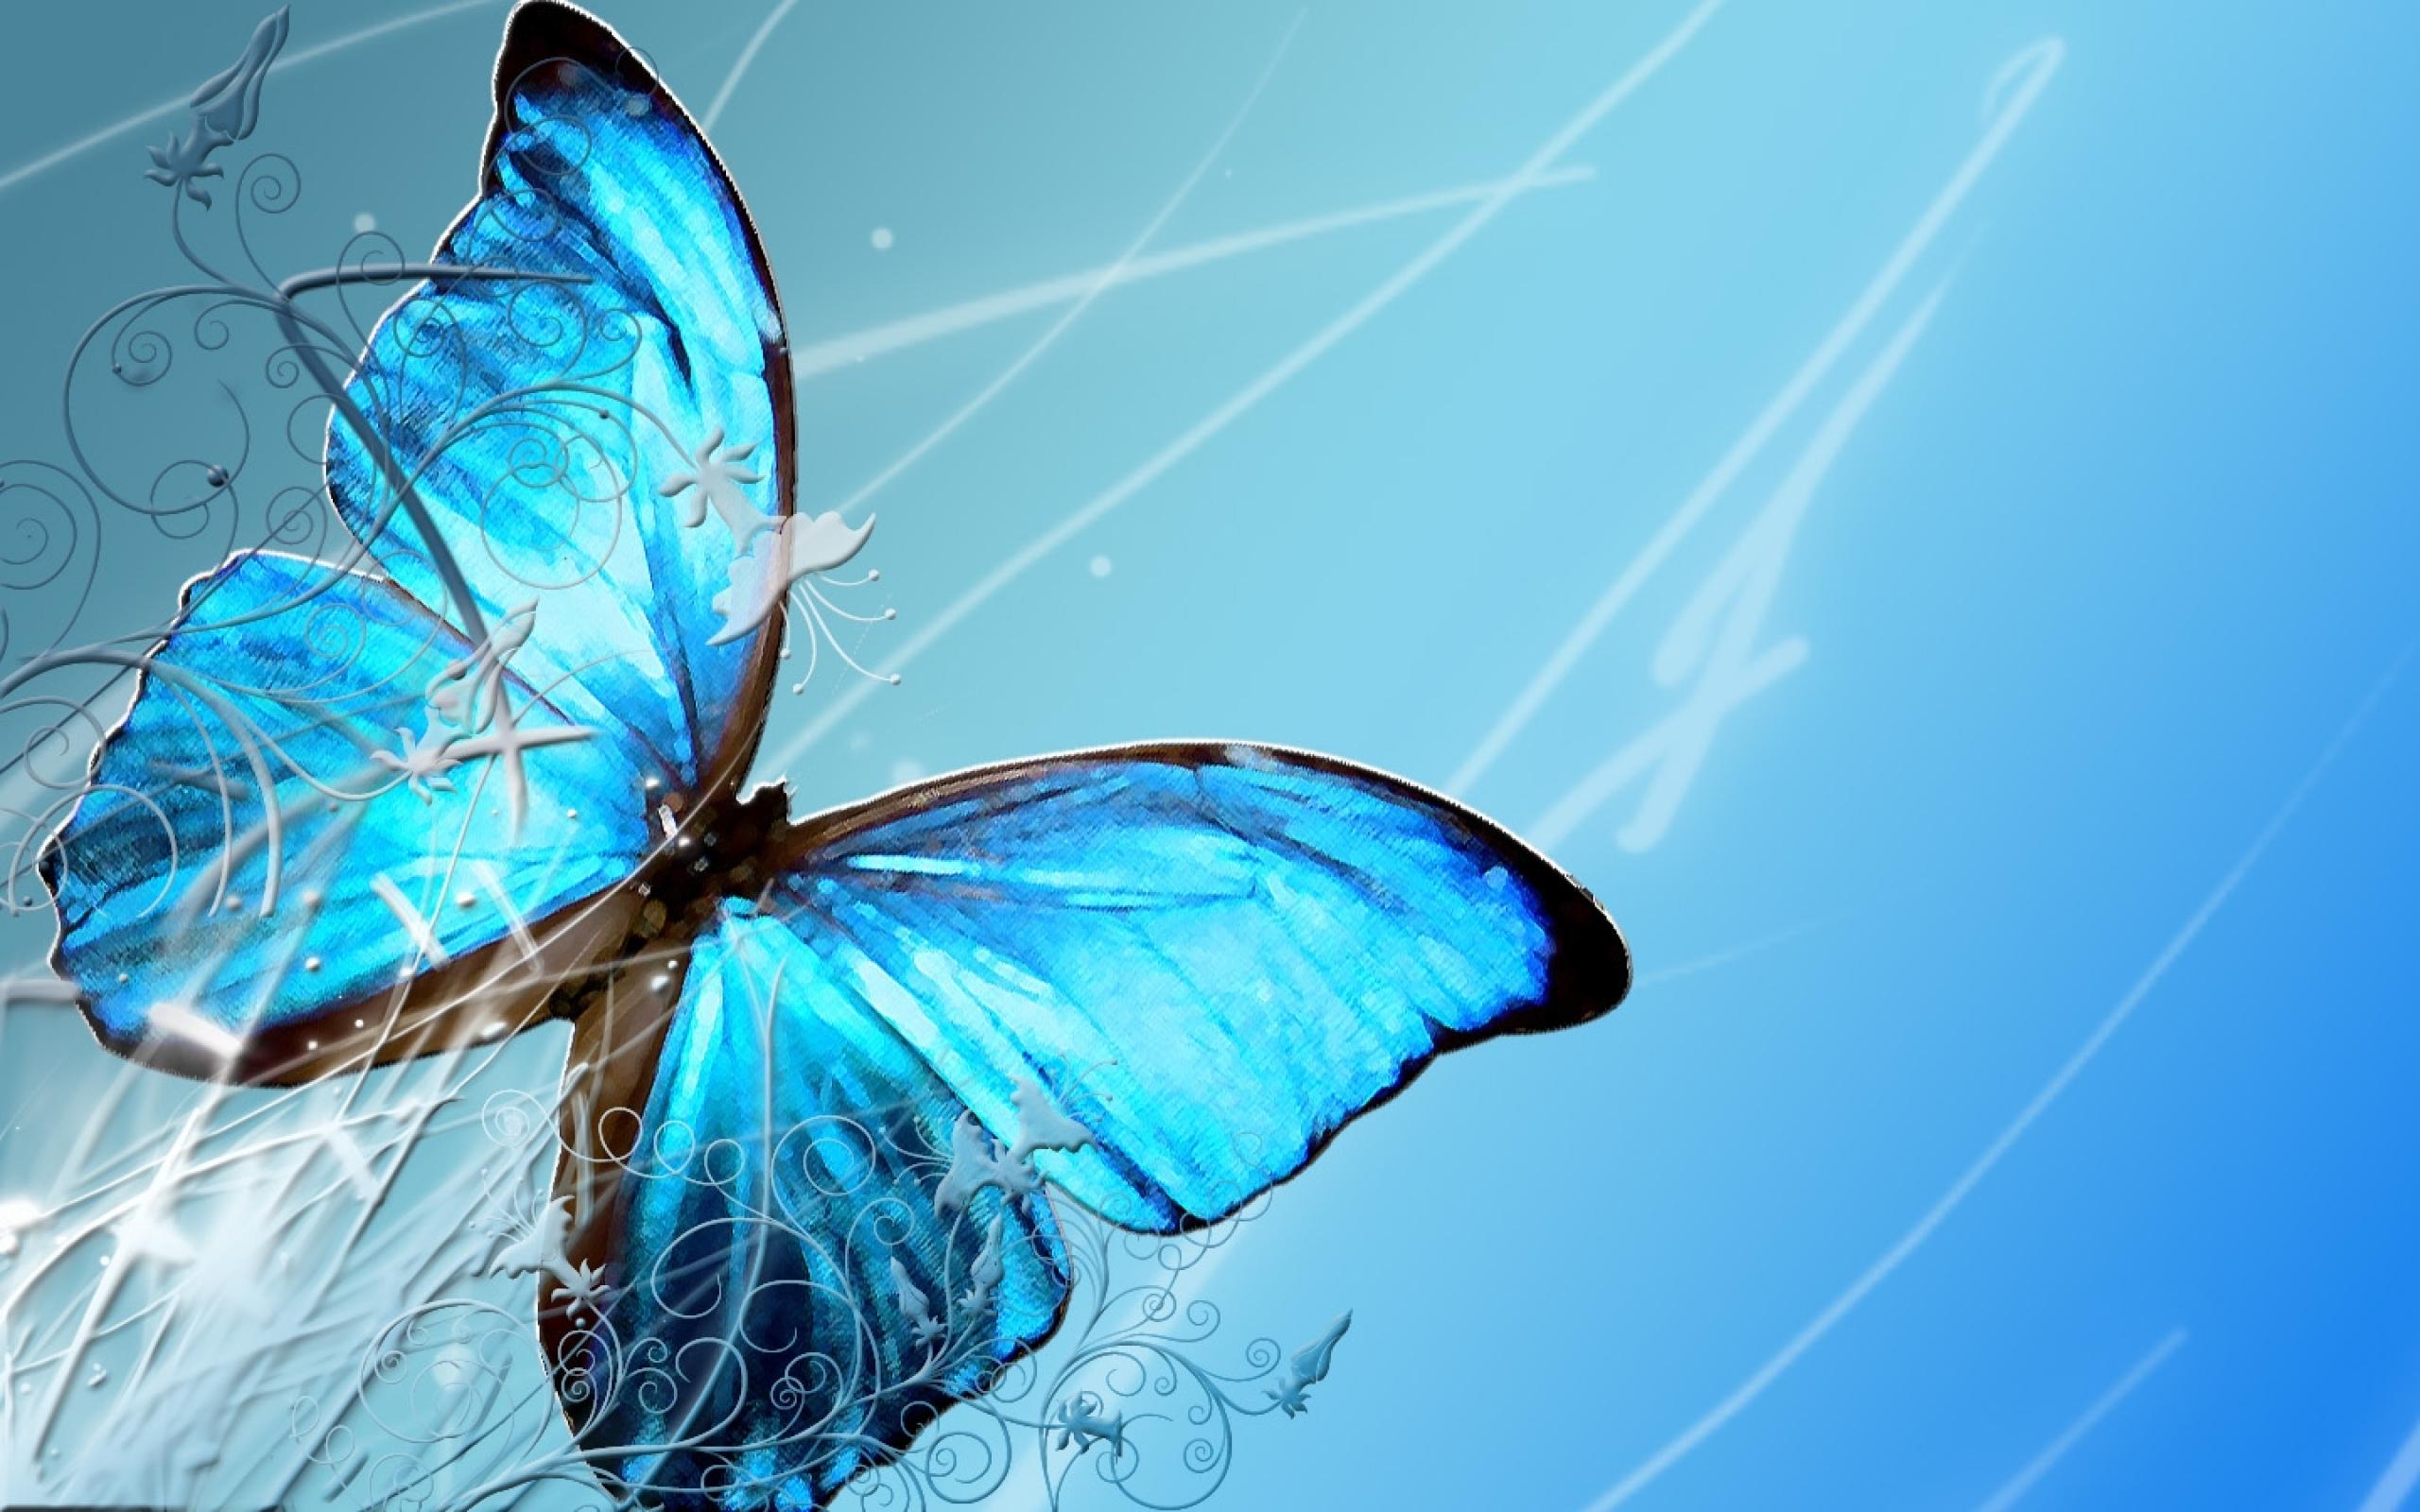 Light Blue Butterfly Desktop Wallpaper in High Resolution at Animals 2560x1600